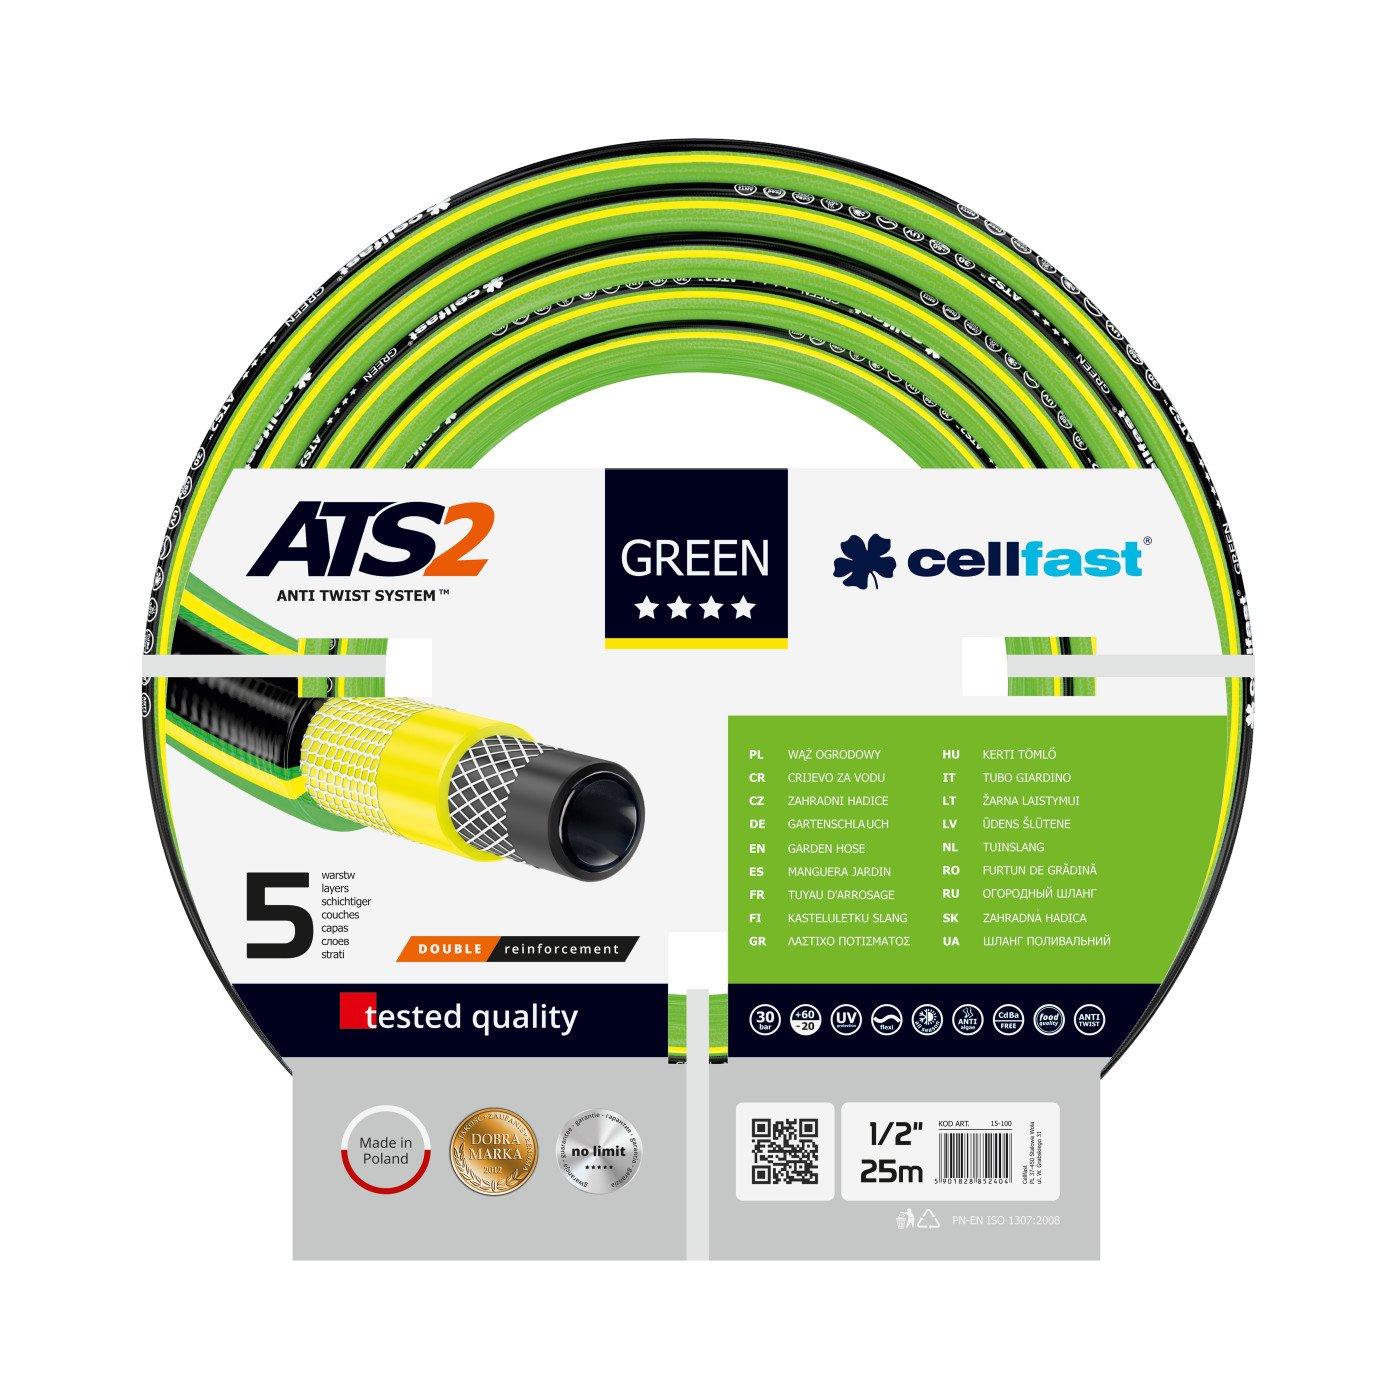 CELLFAST - TUINSLANG - GREEN ATS2™ - 1/2